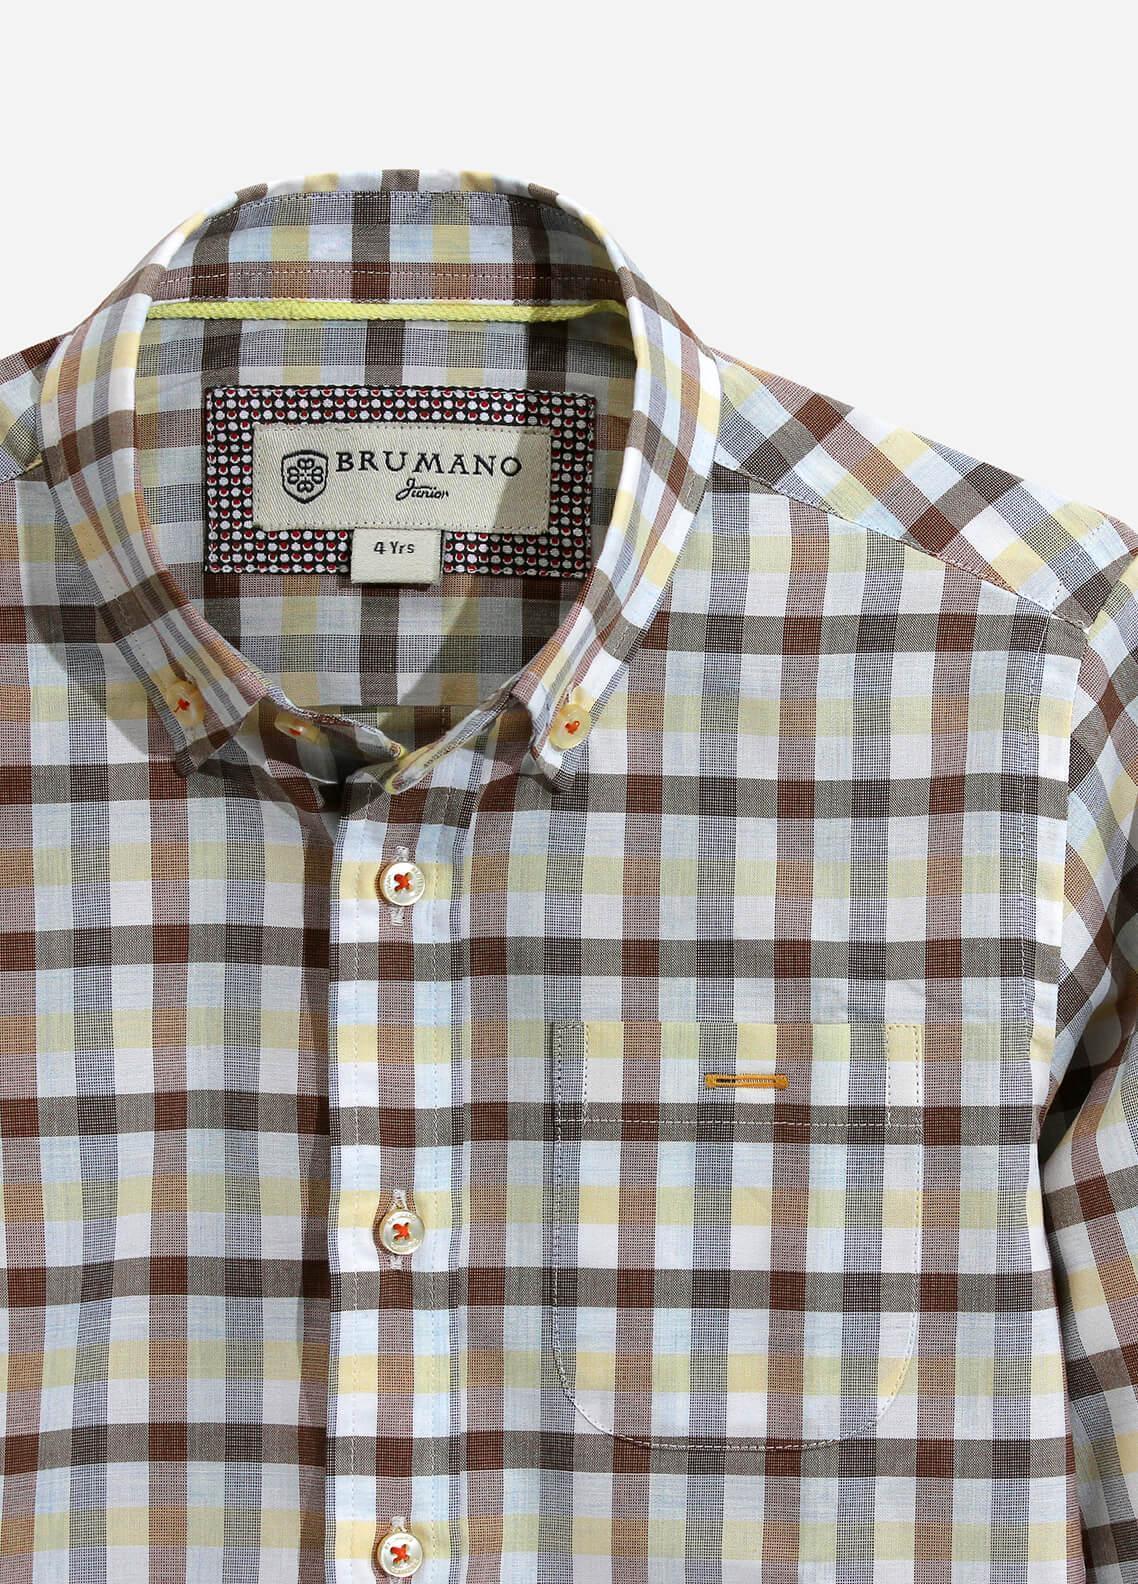 Brumano Cotton Casual Shirts for Boys - Multi BRM-835